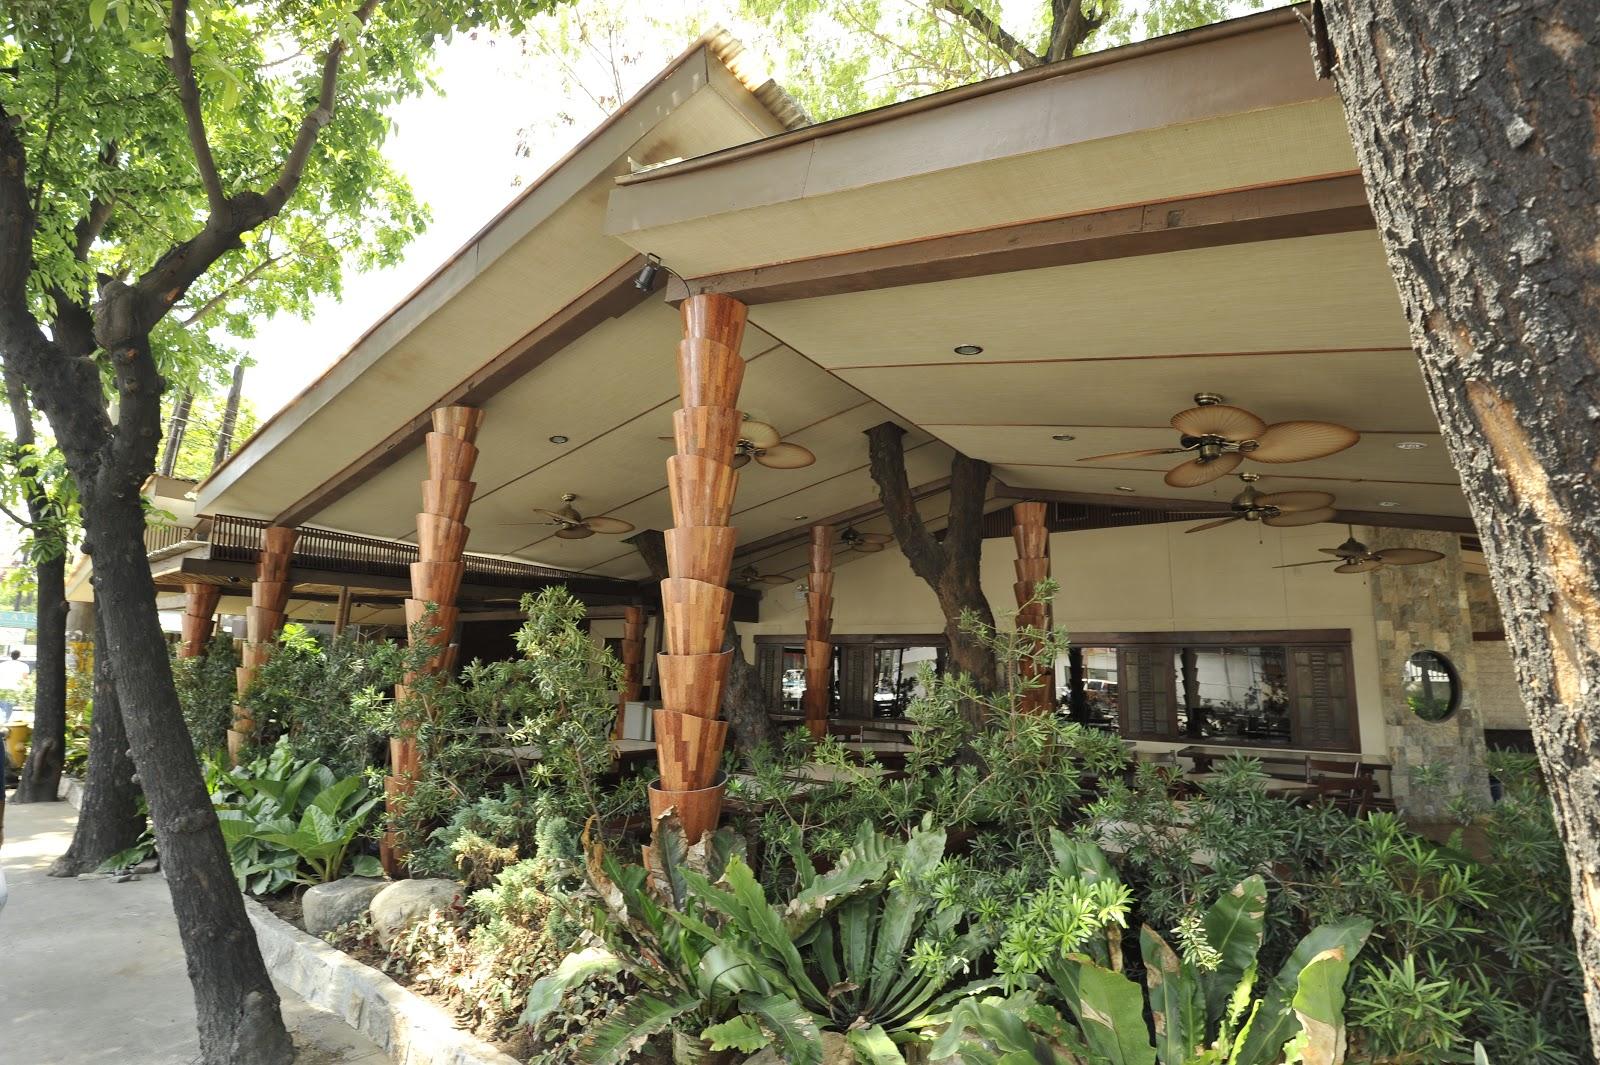 Hl designs golden cowrie native restaurant